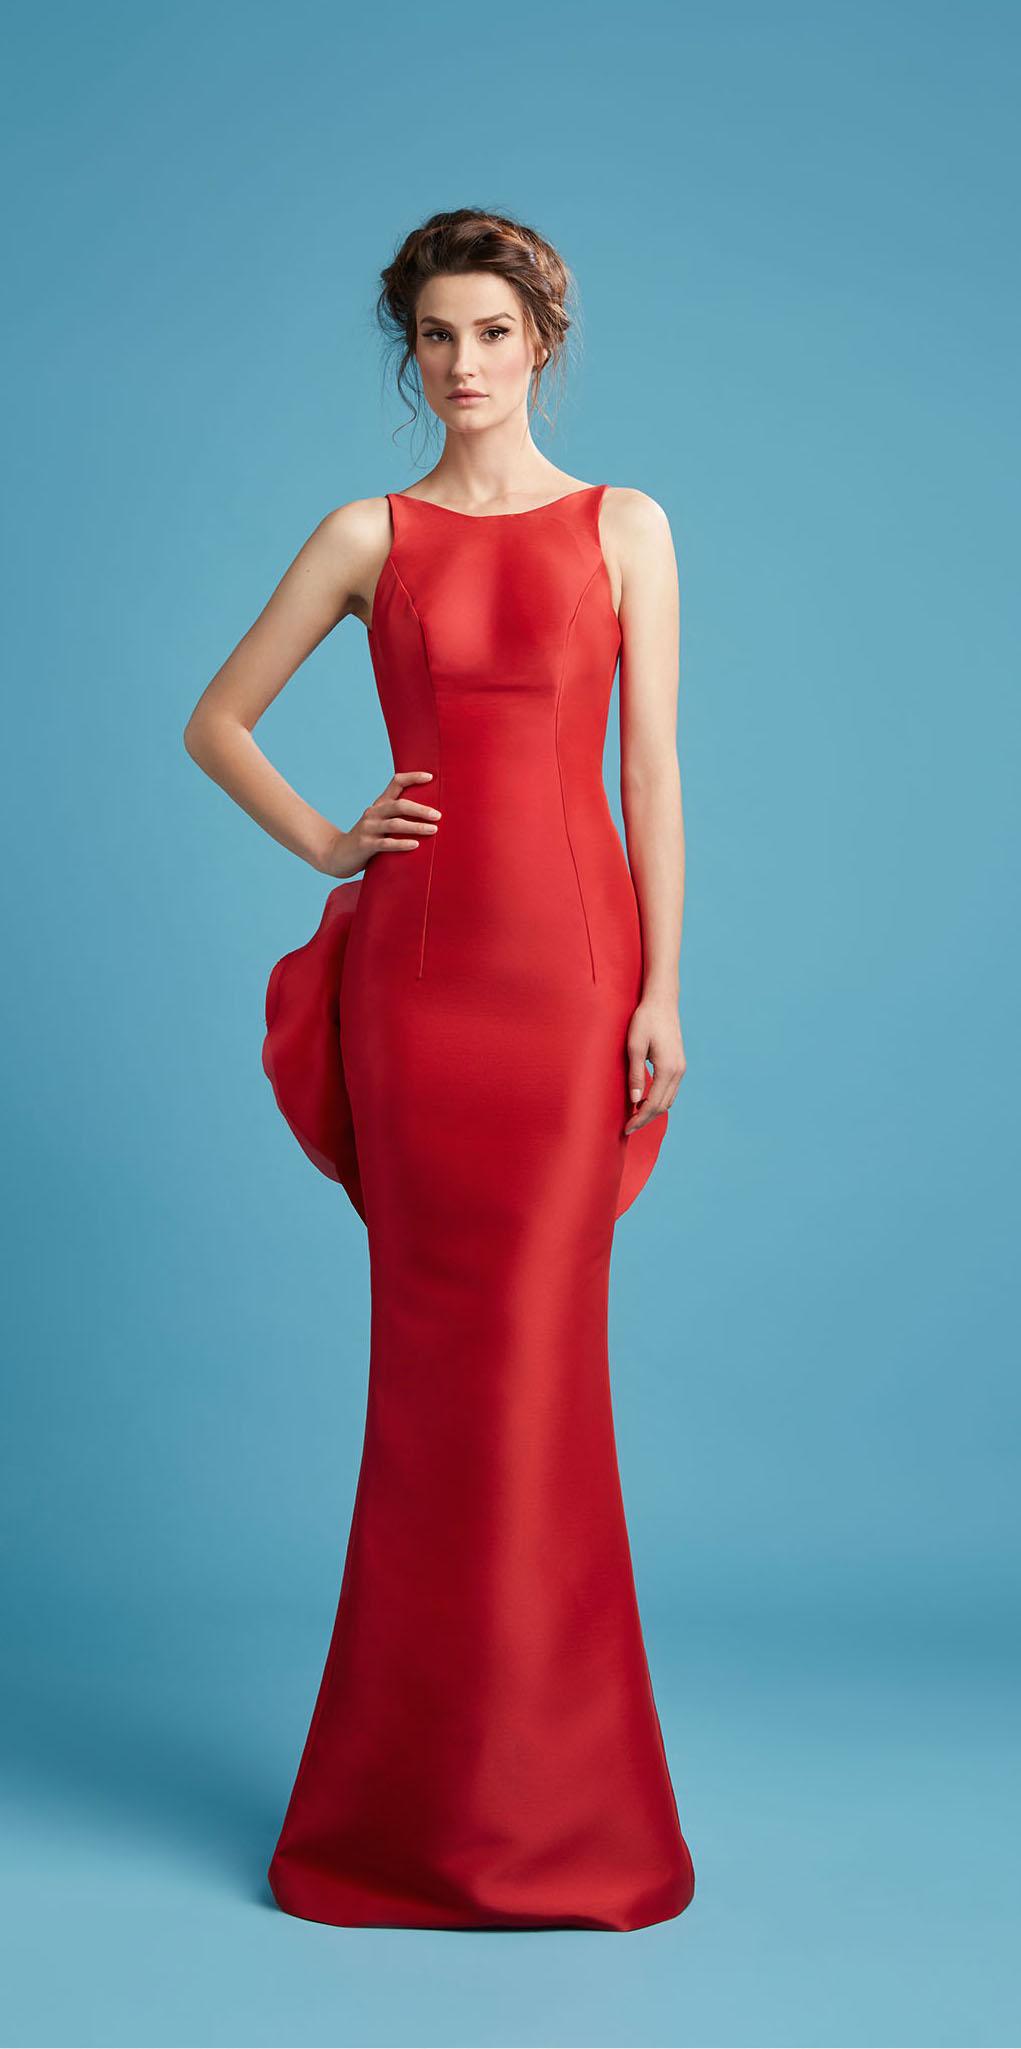 red bridesmaid dress hamda al fahim